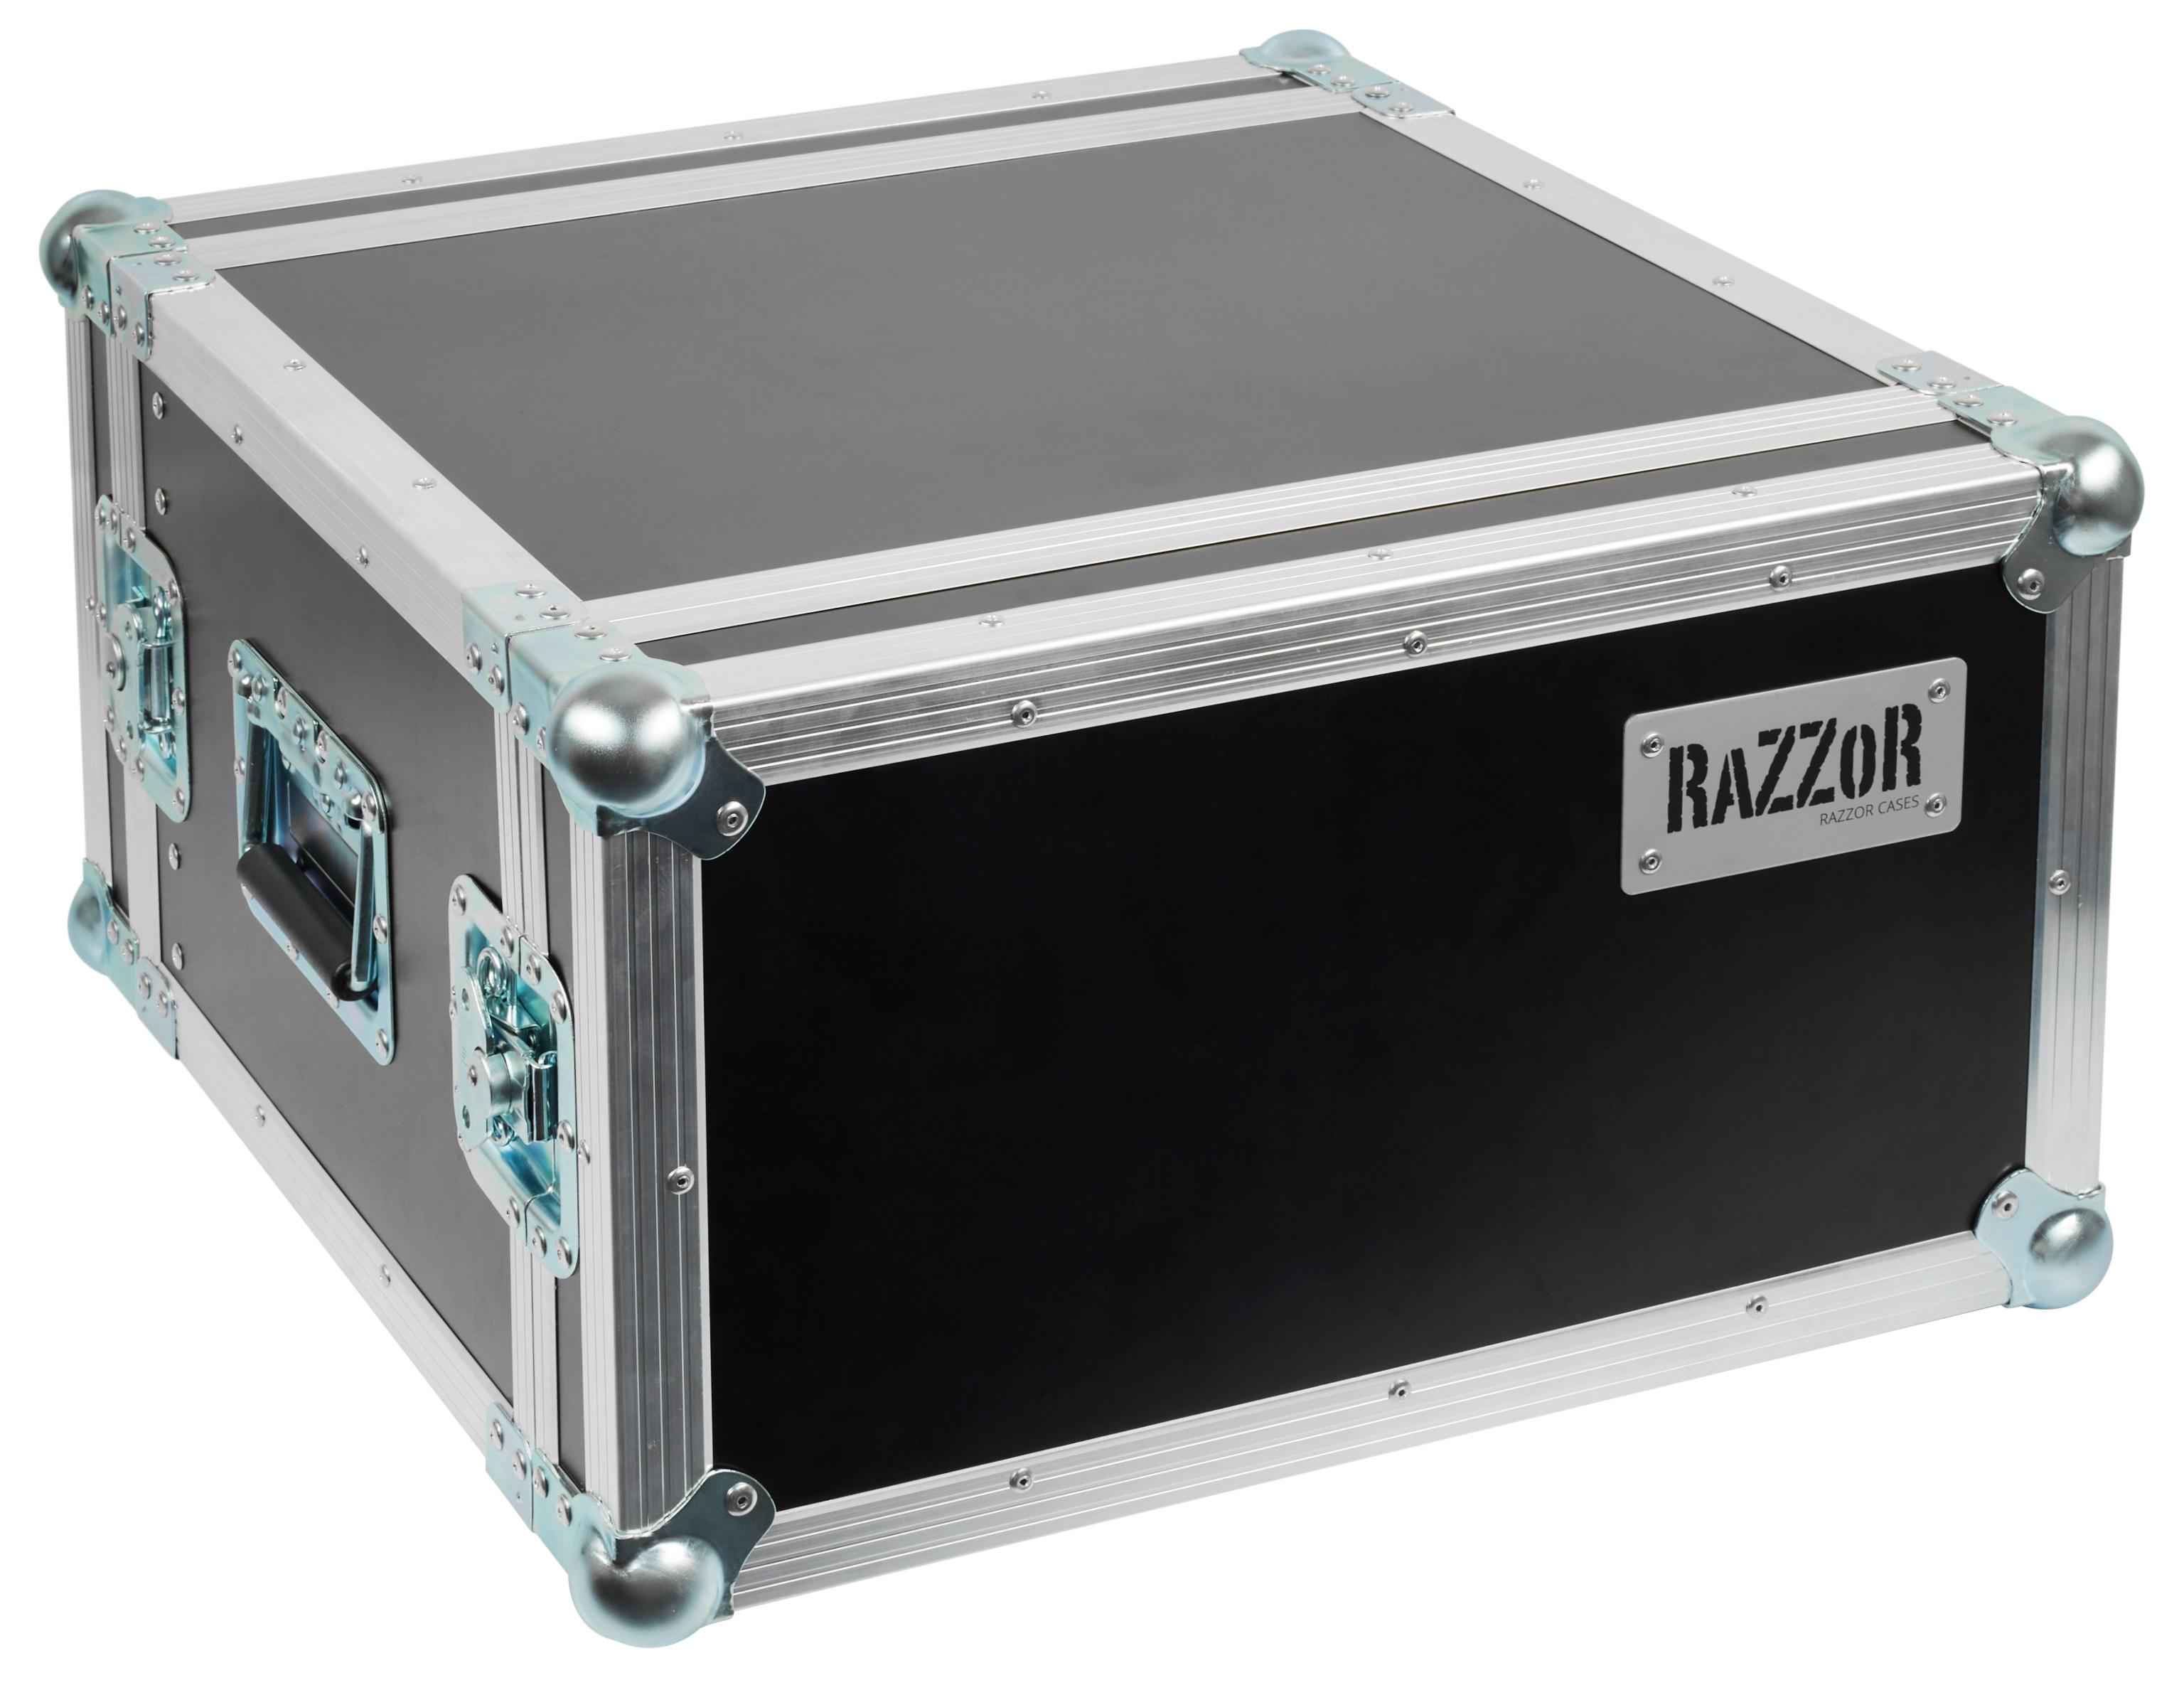 Razzor Cases 6U 3x Yamaha Tio 1608D